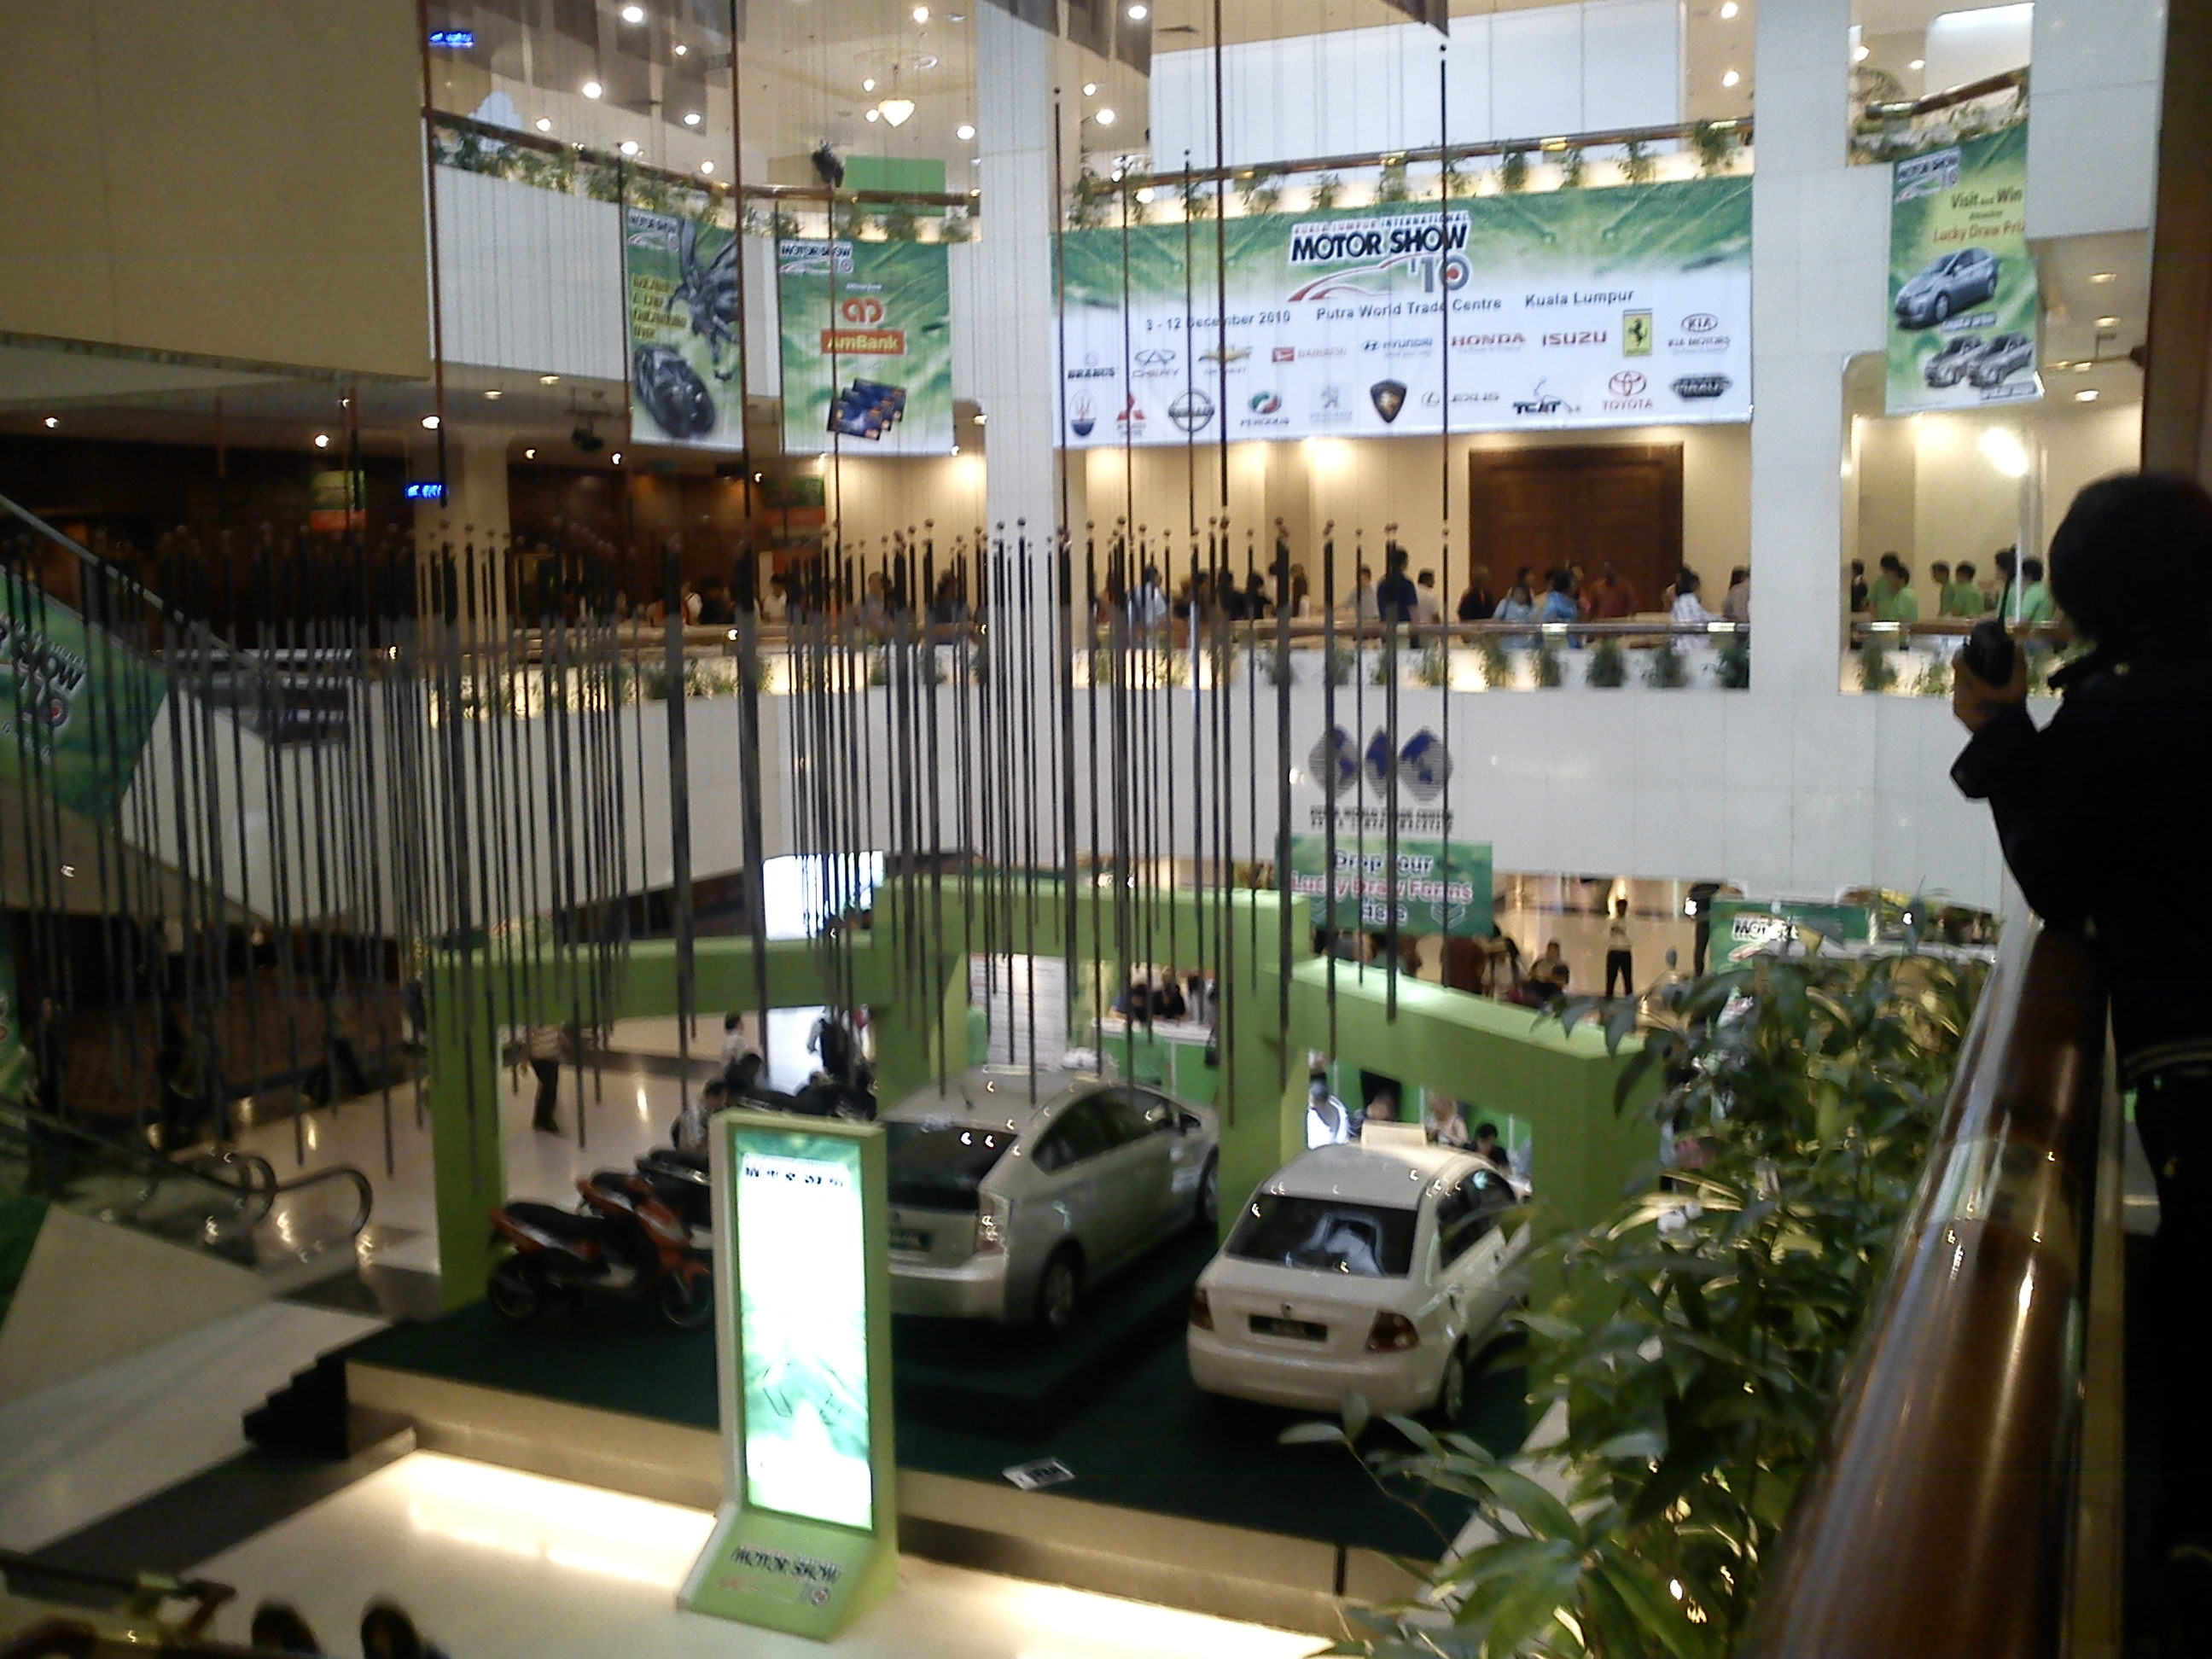 Kuala Lumpur International Motor Show Coverage - Car show insurance coverage